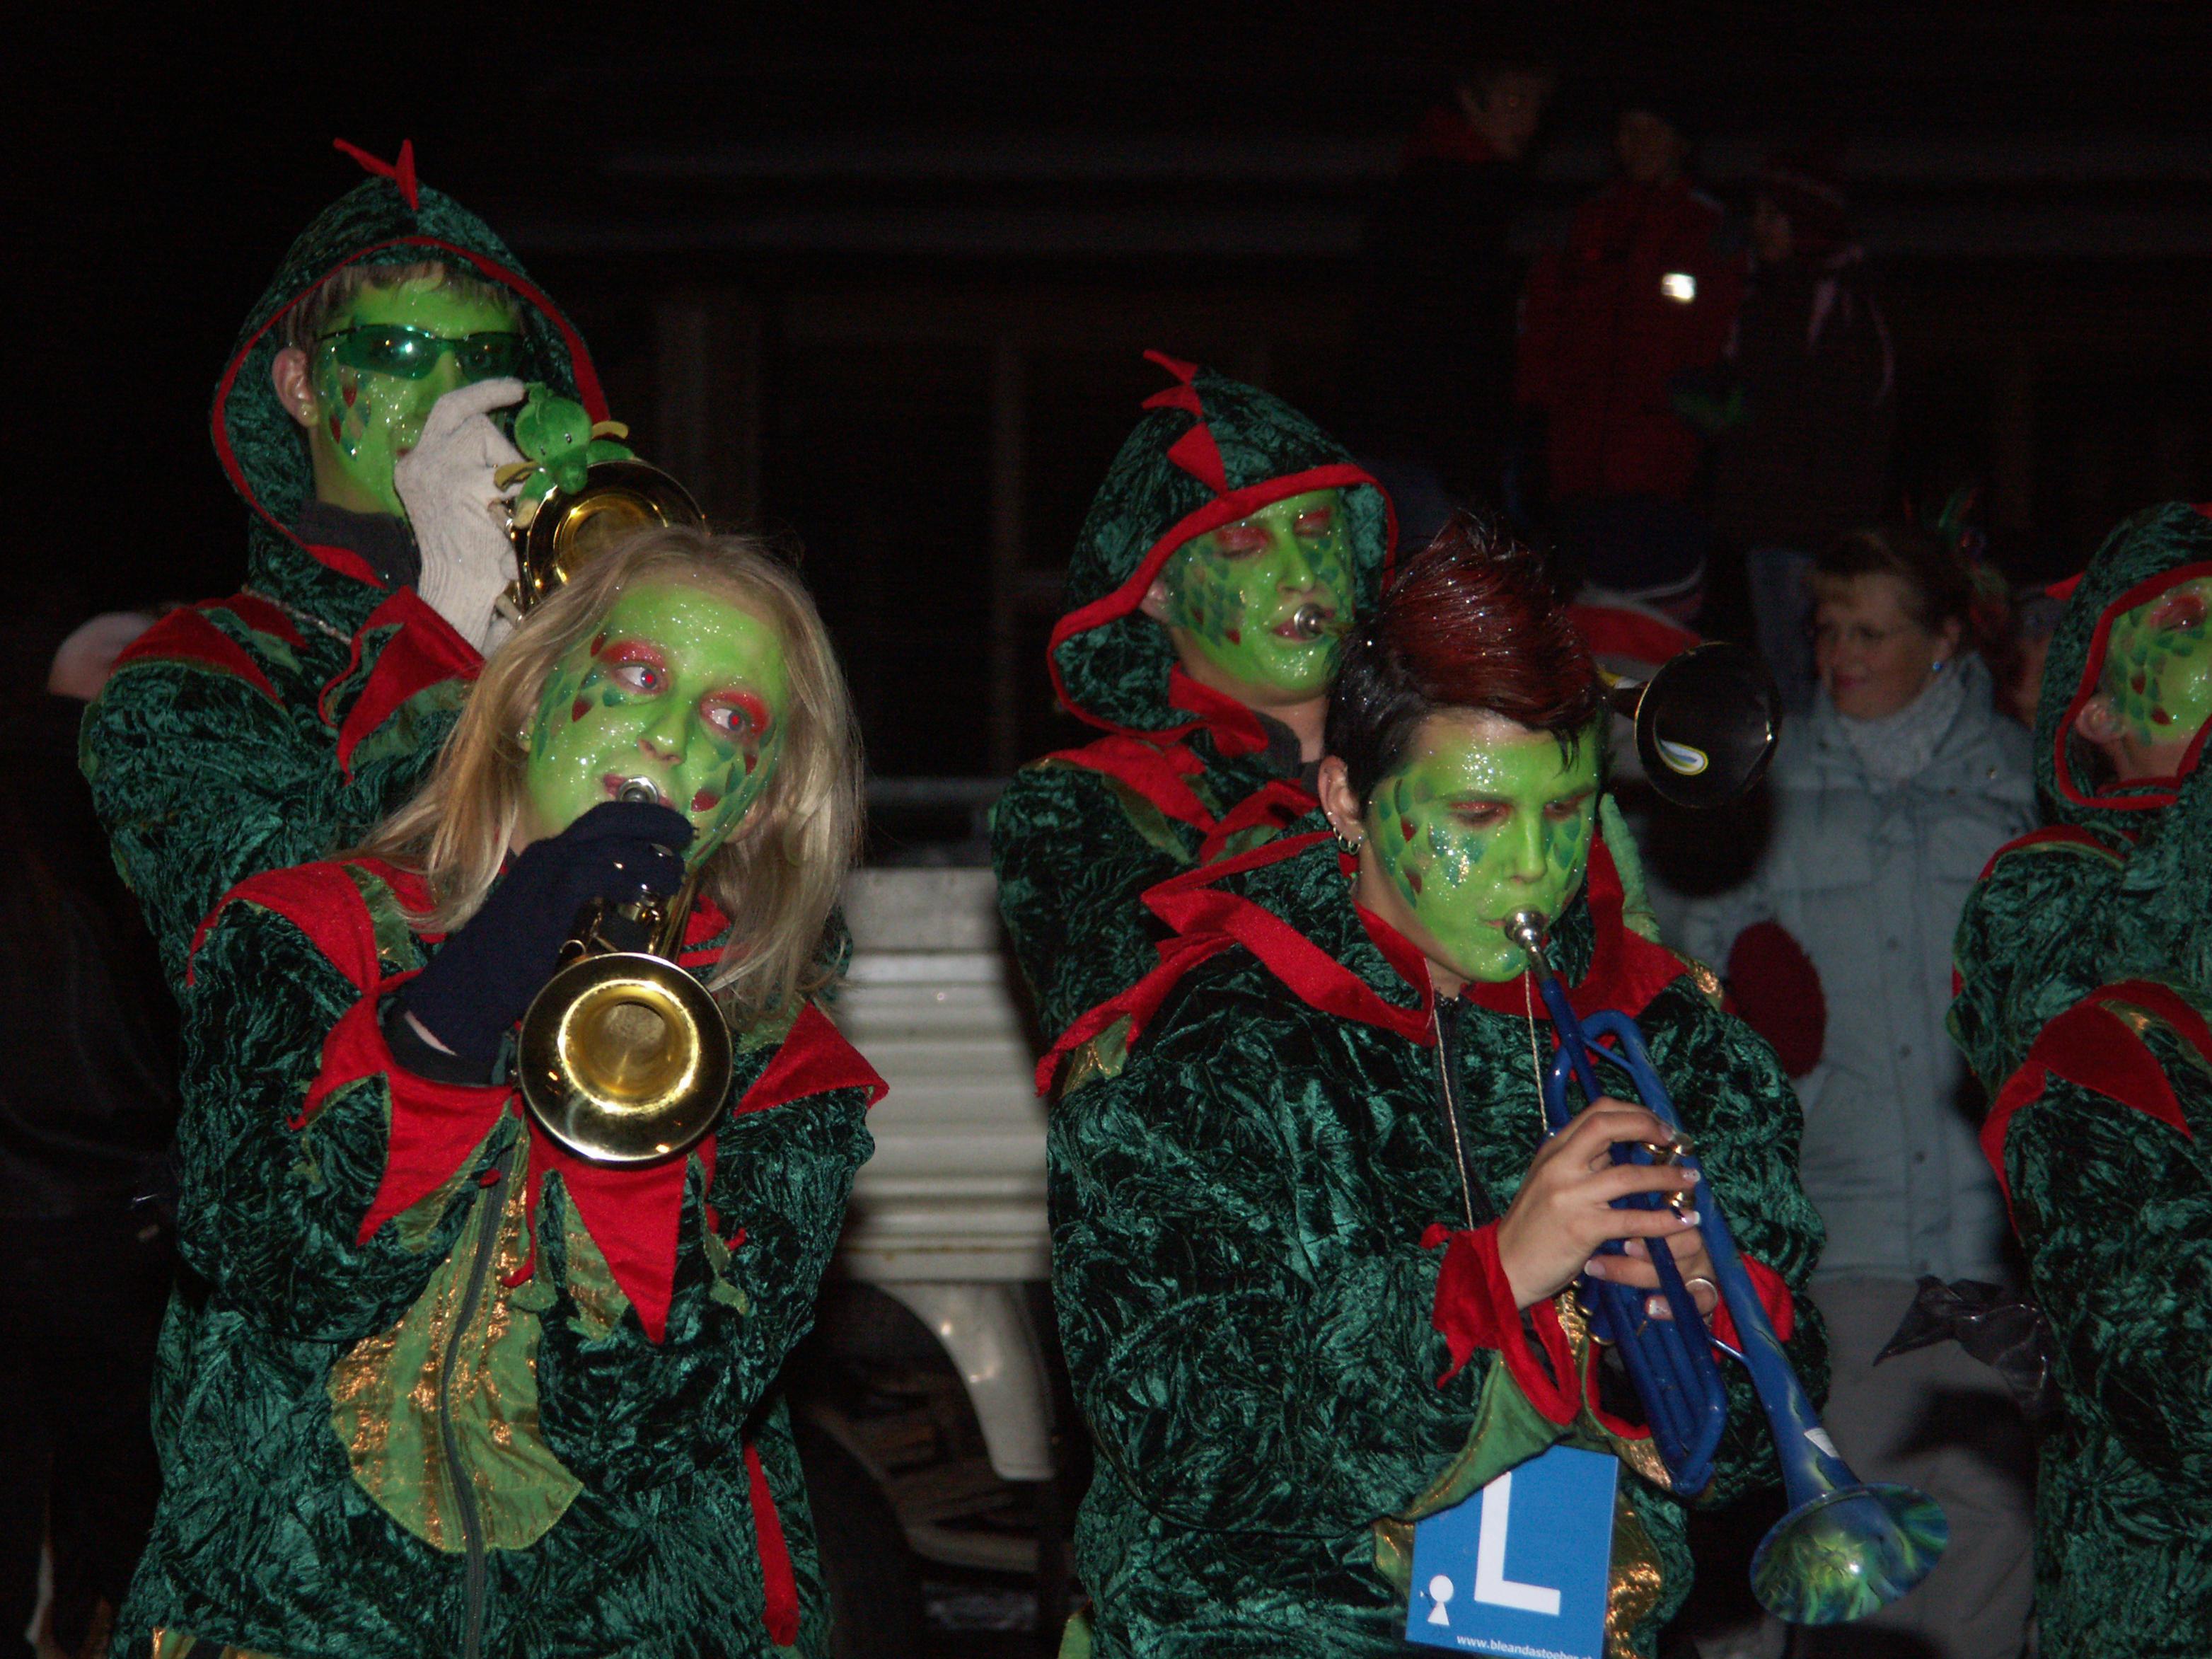 Halloween 2020 Gams File:Monsterkonzert, Gams. 2006 02 11 20 43 54.   Wikimedia Commons